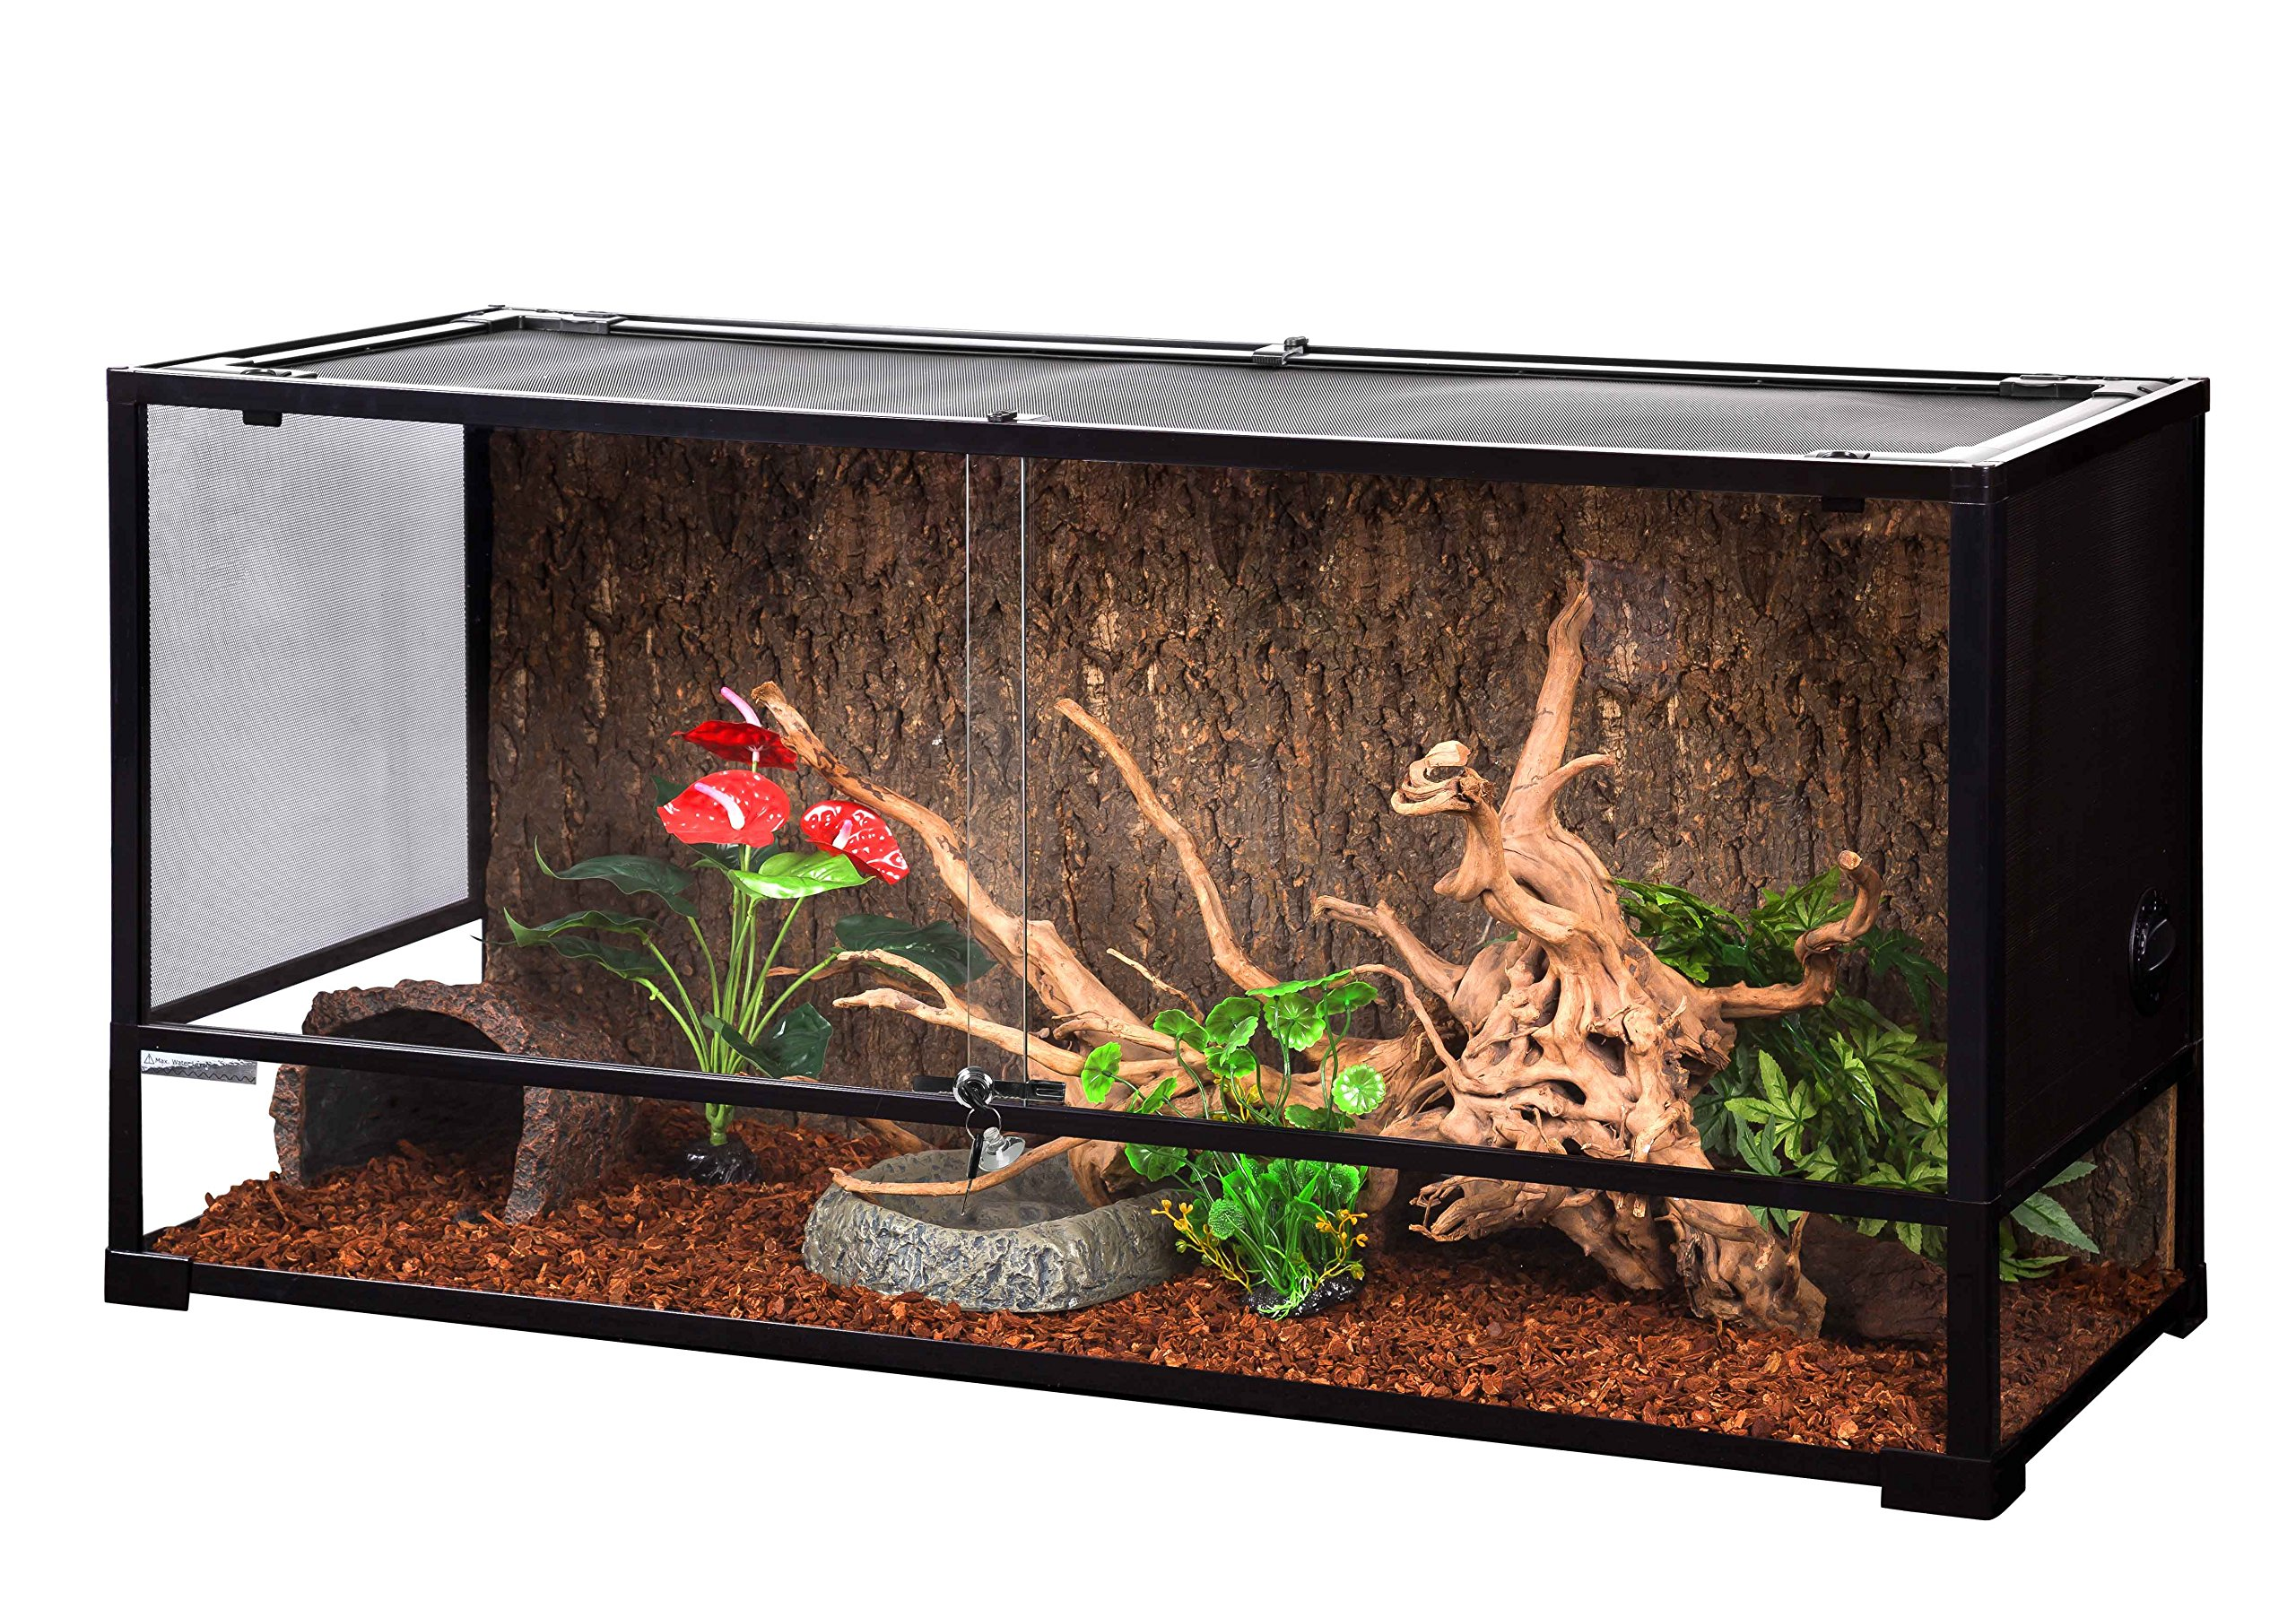 Oiibo Knock Down Glass Terrarium (Extra Large, Tall 47'' x 18'' x 24'') by Oiibo (Image #1)